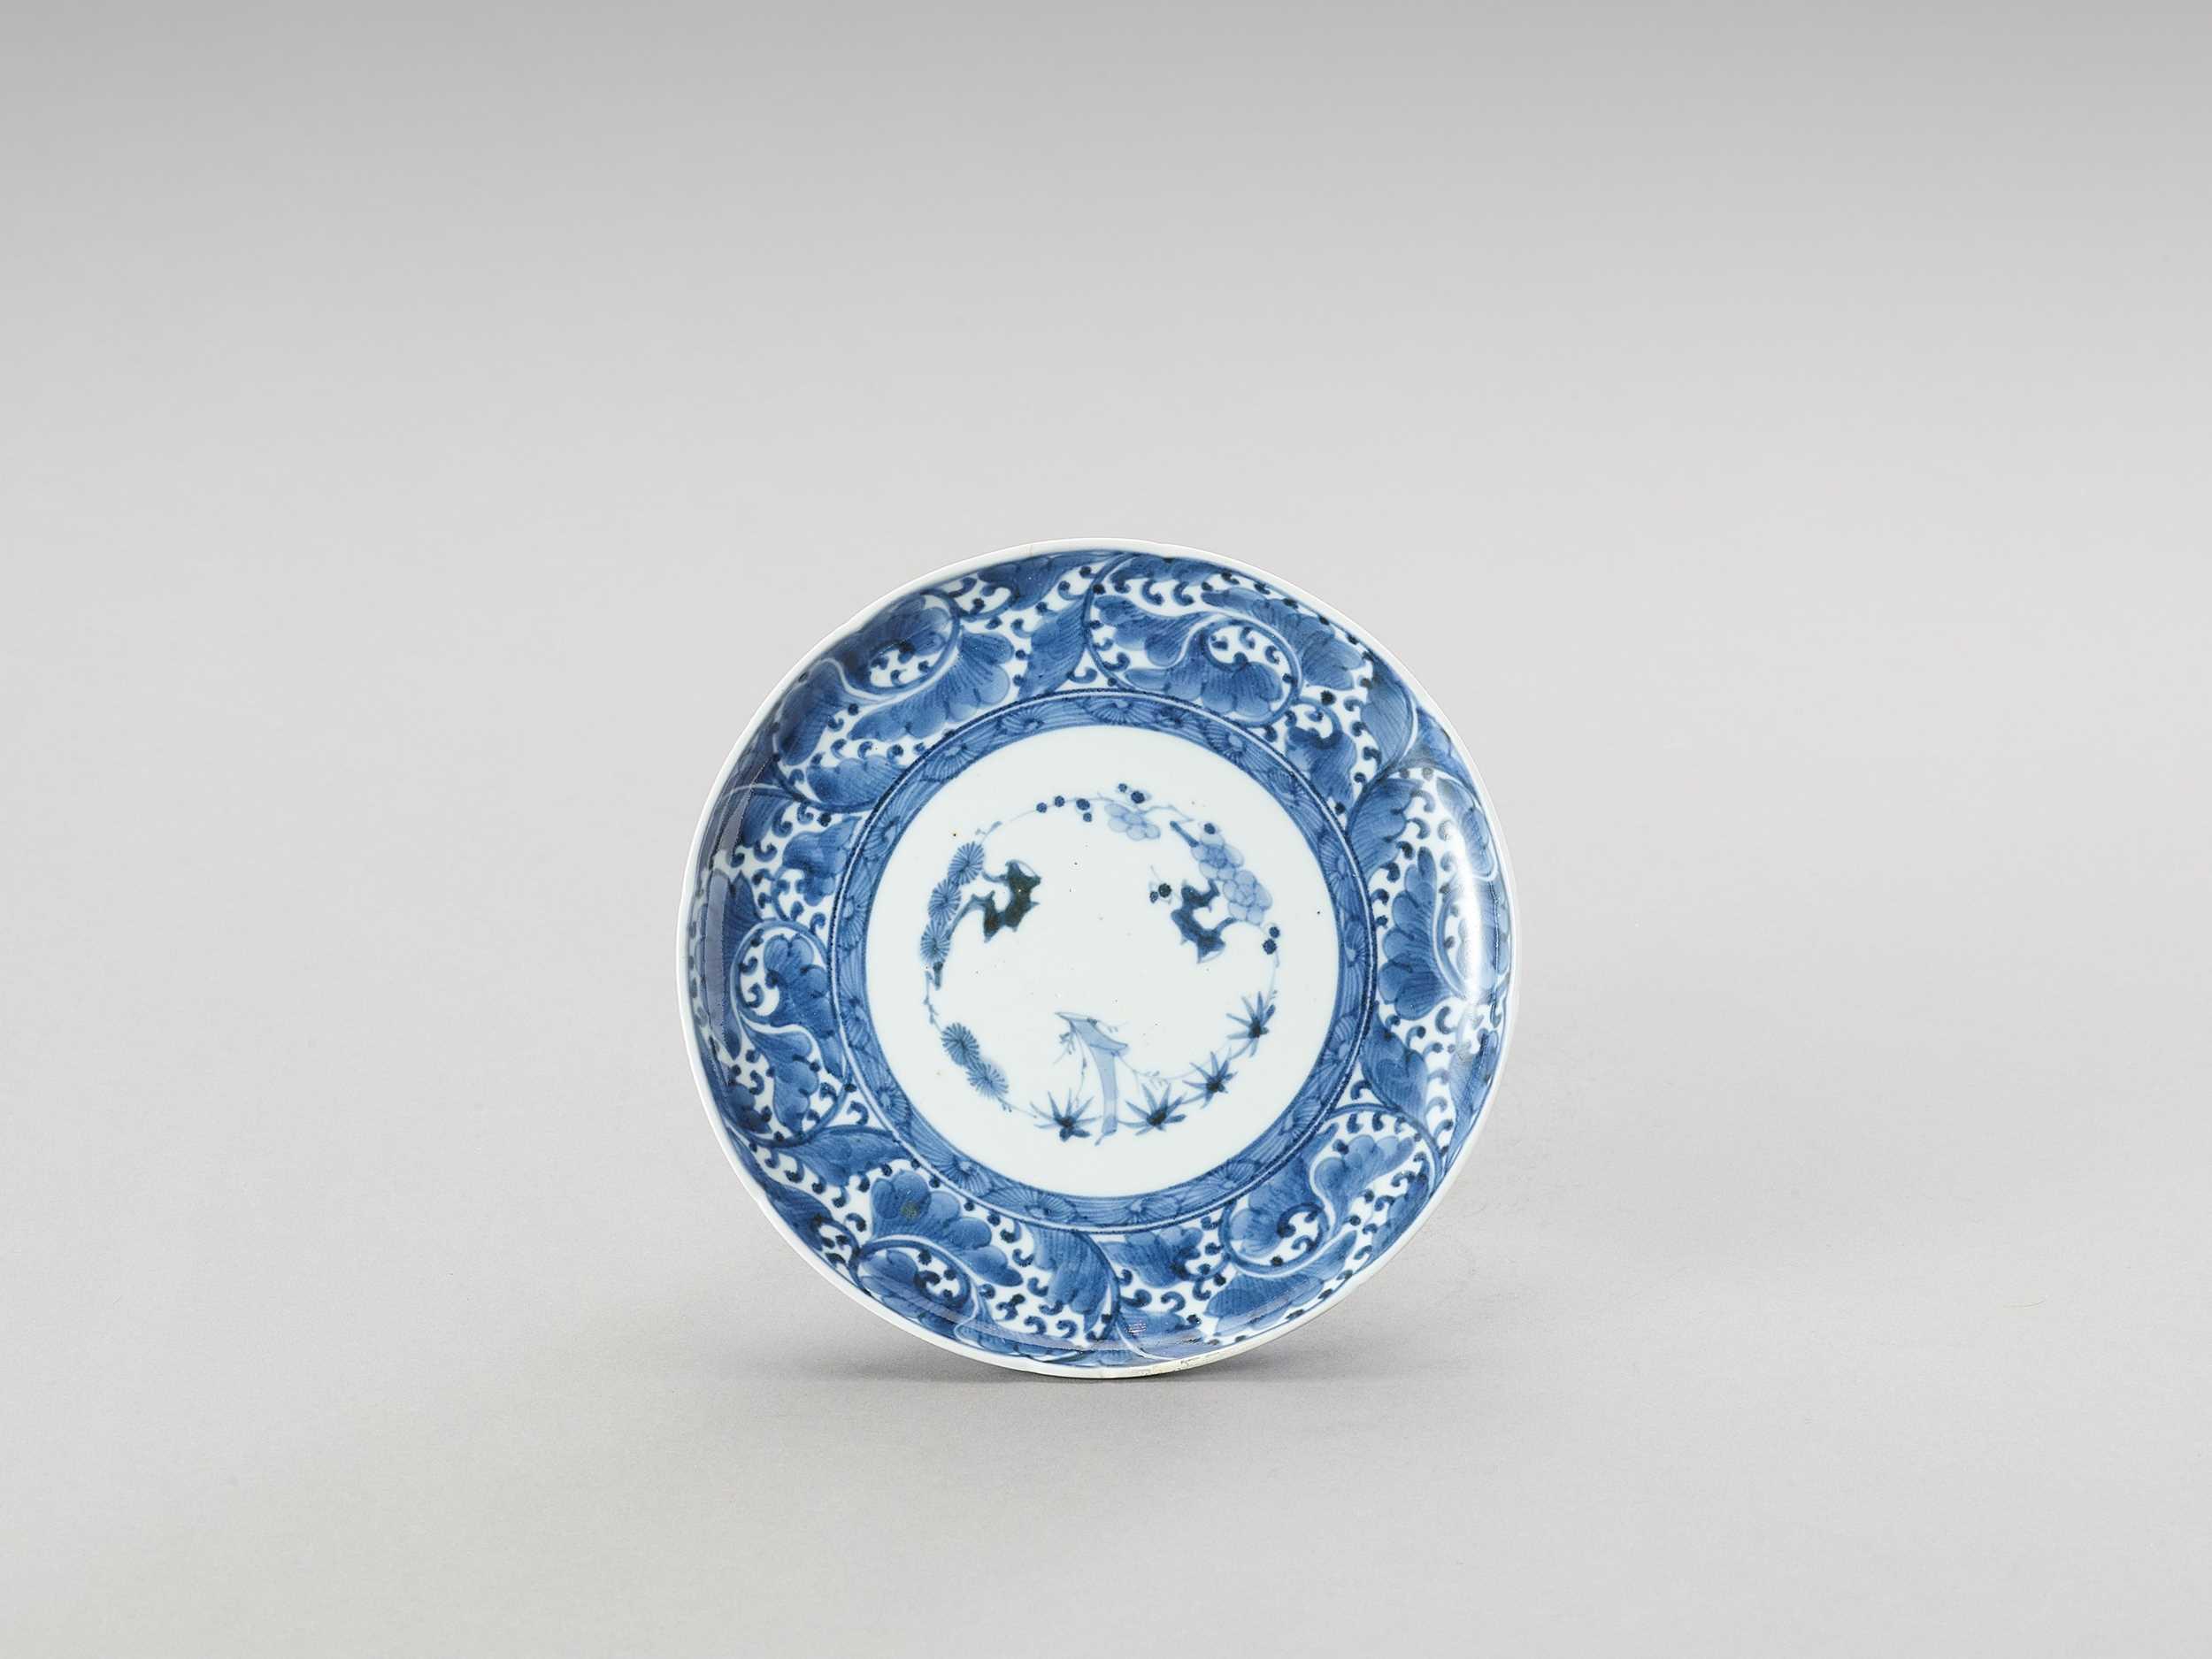 Lot 1028 - A BLUE AND WHITE ARITA PORCELAIN 'FLORAL' DISH